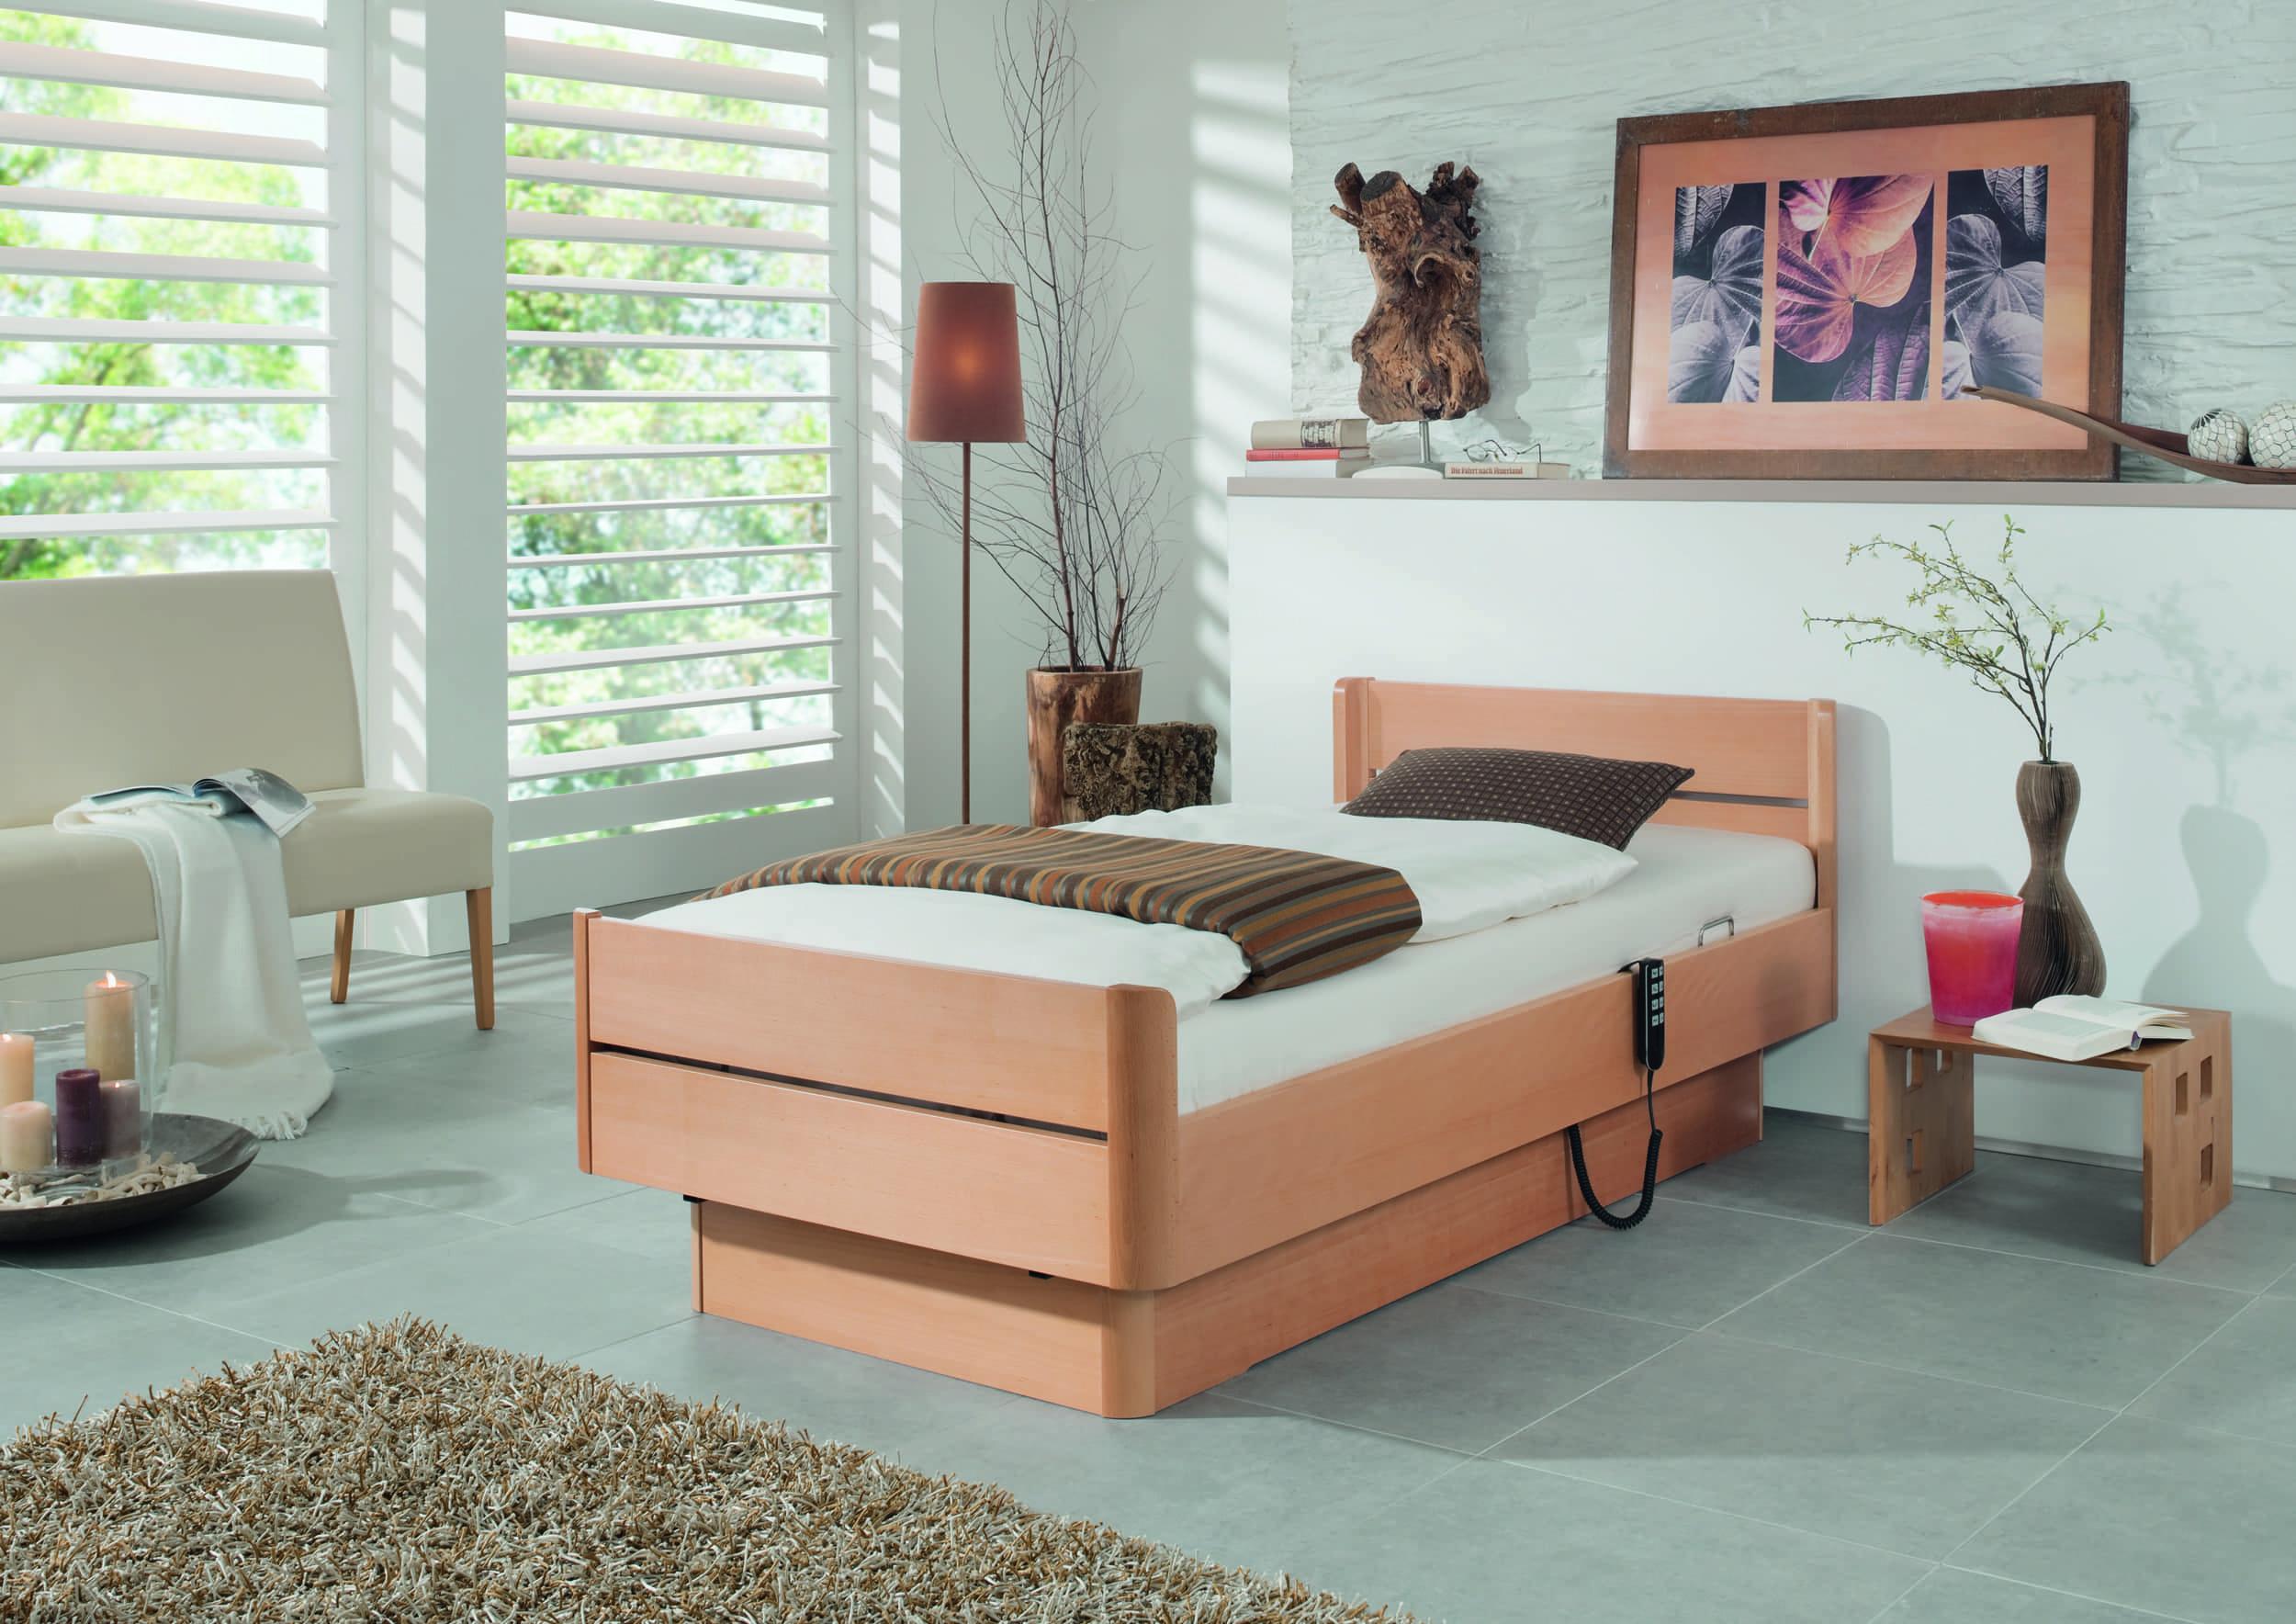 kirchner comfortbetten vom fachh ndler hillebrand liegen sitzen kassel liegen sitzen betten. Black Bedroom Furniture Sets. Home Design Ideas